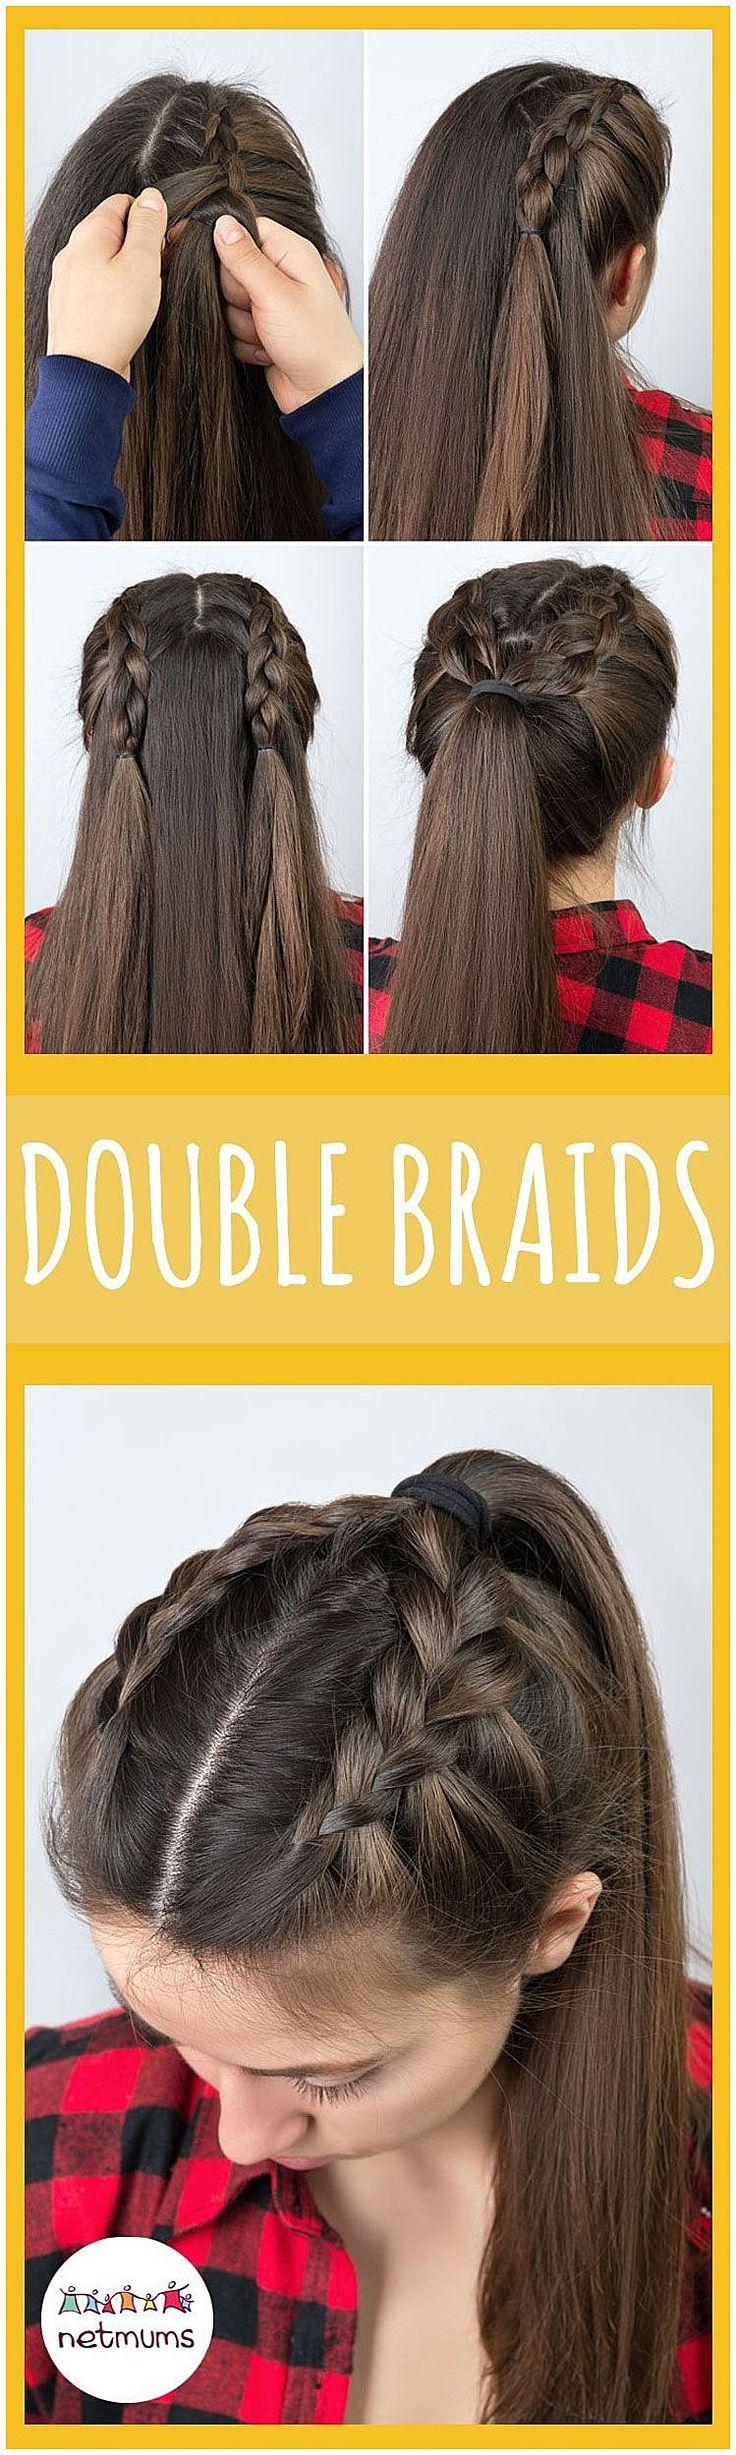 best flätat hår images on pinterest braided hairstyles braid